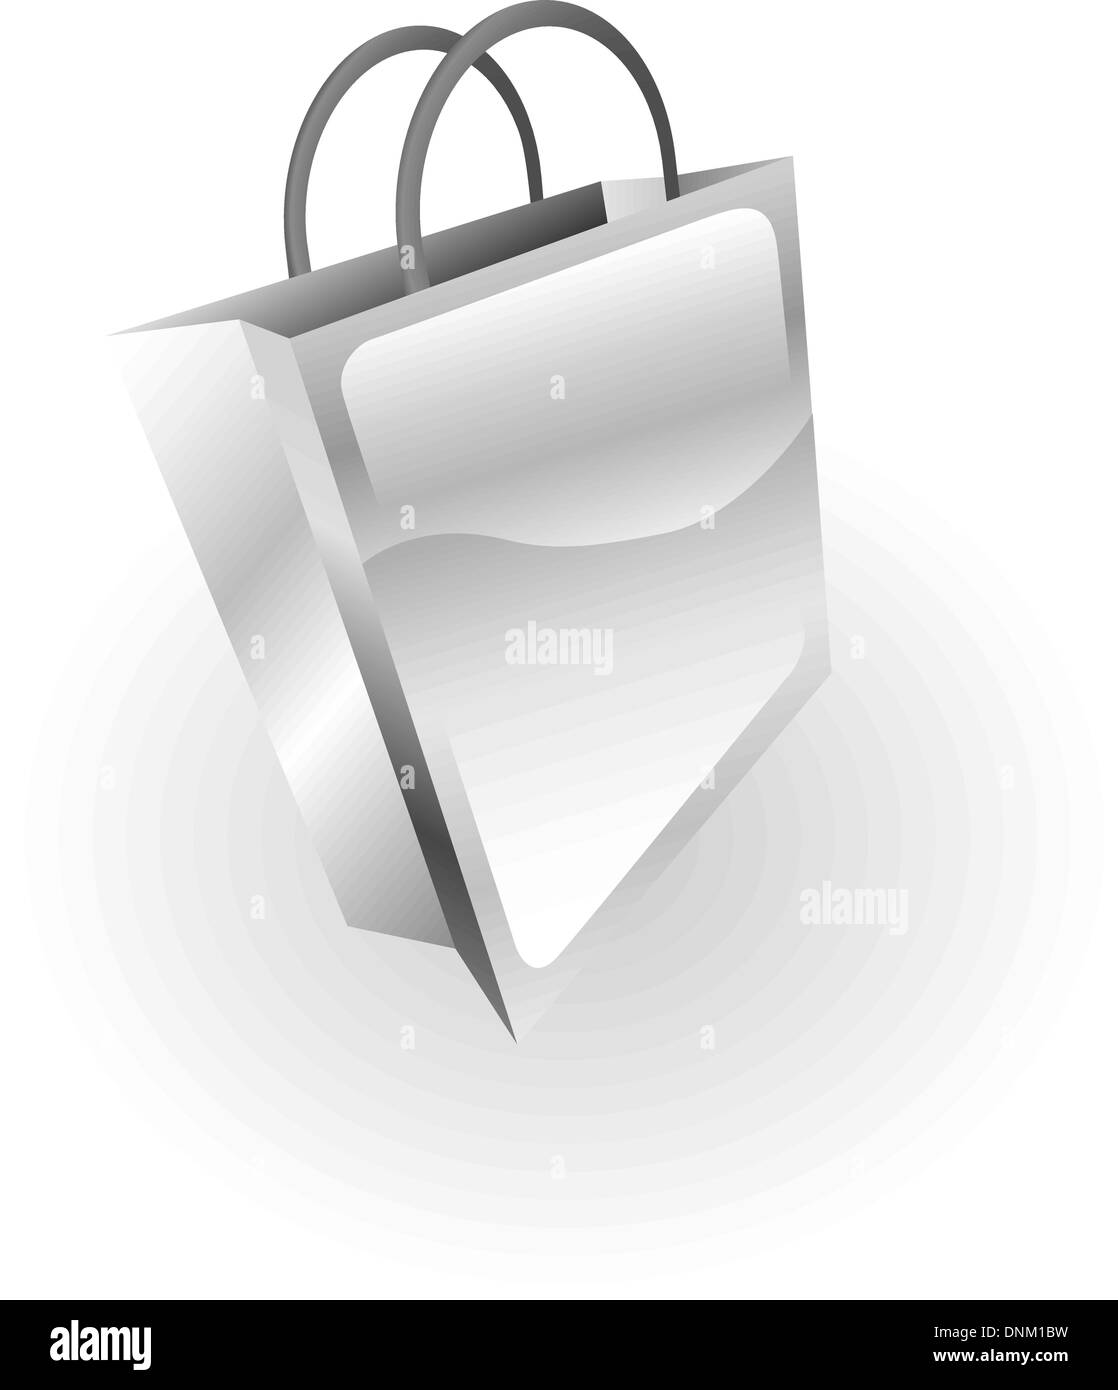 Illustration of a silver metallic bag - Stock Vector